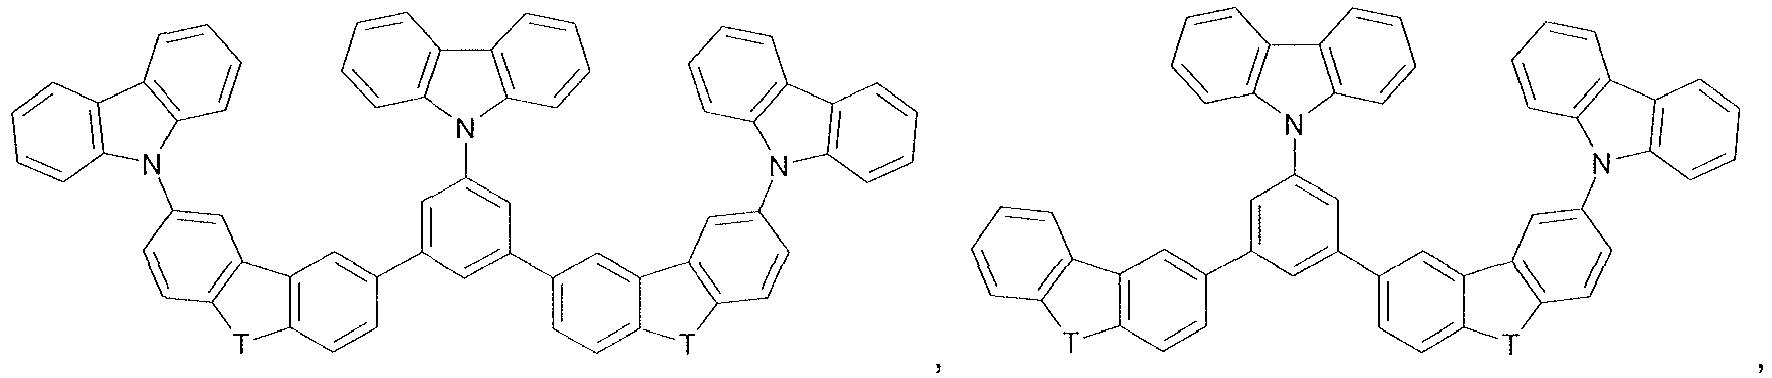 Figure imgb0683